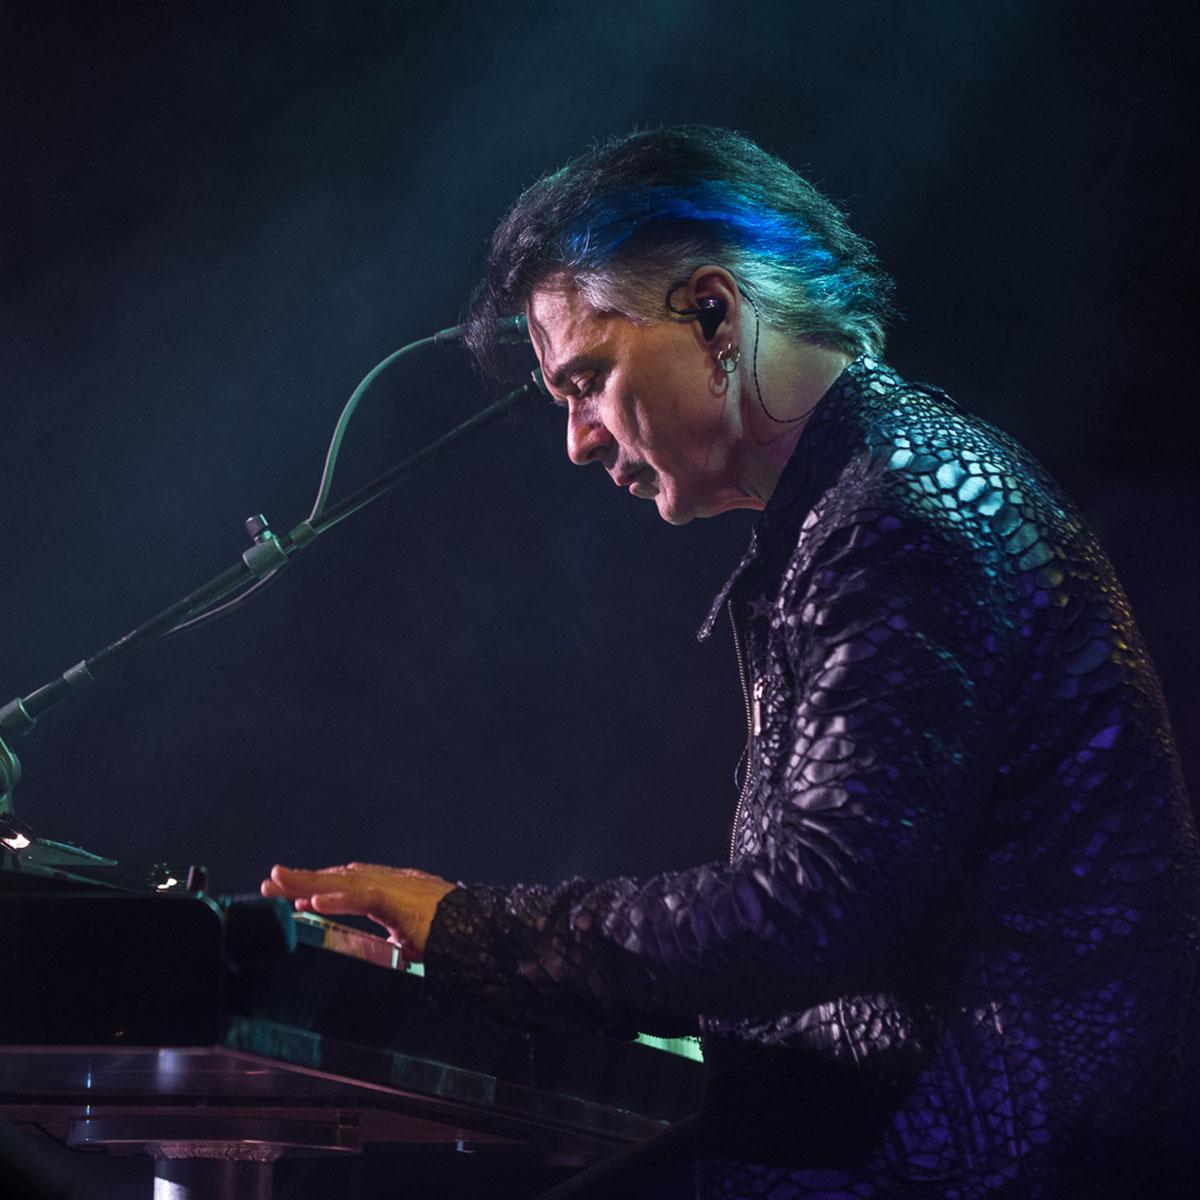 Gowan Live - Photo by Claude Dufresne